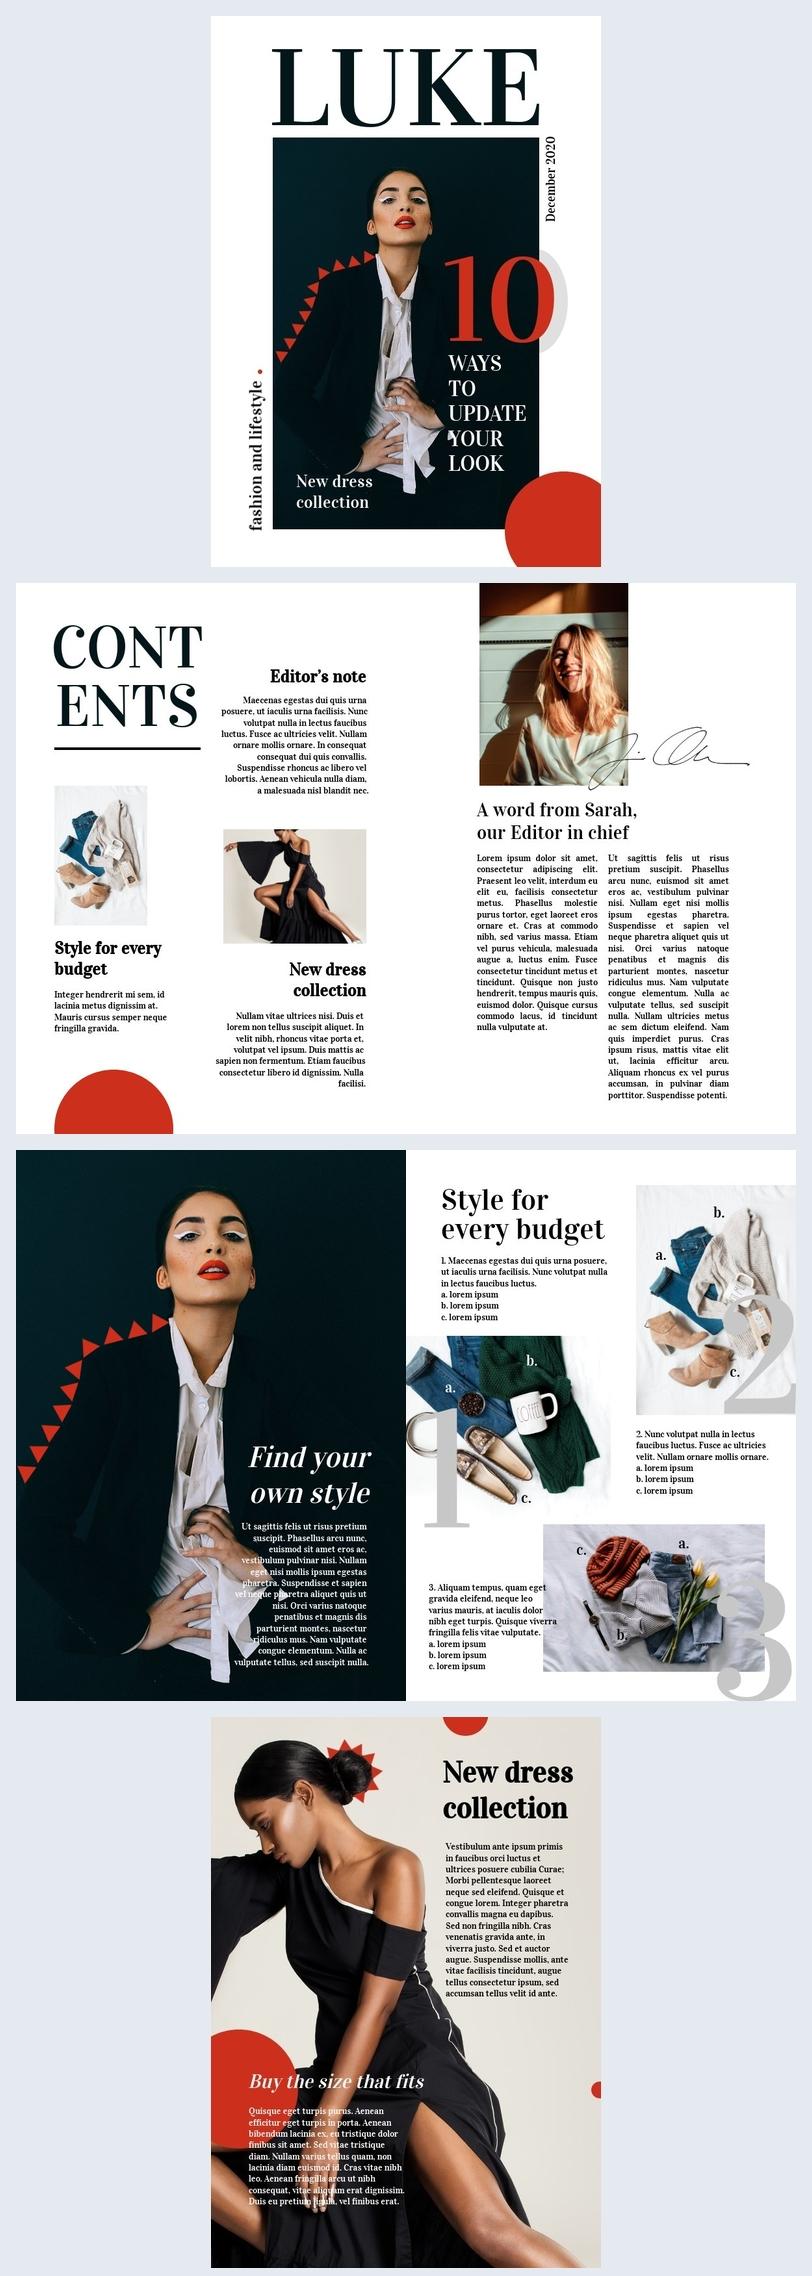 Kreatives Design des Modemagazin-Layouts